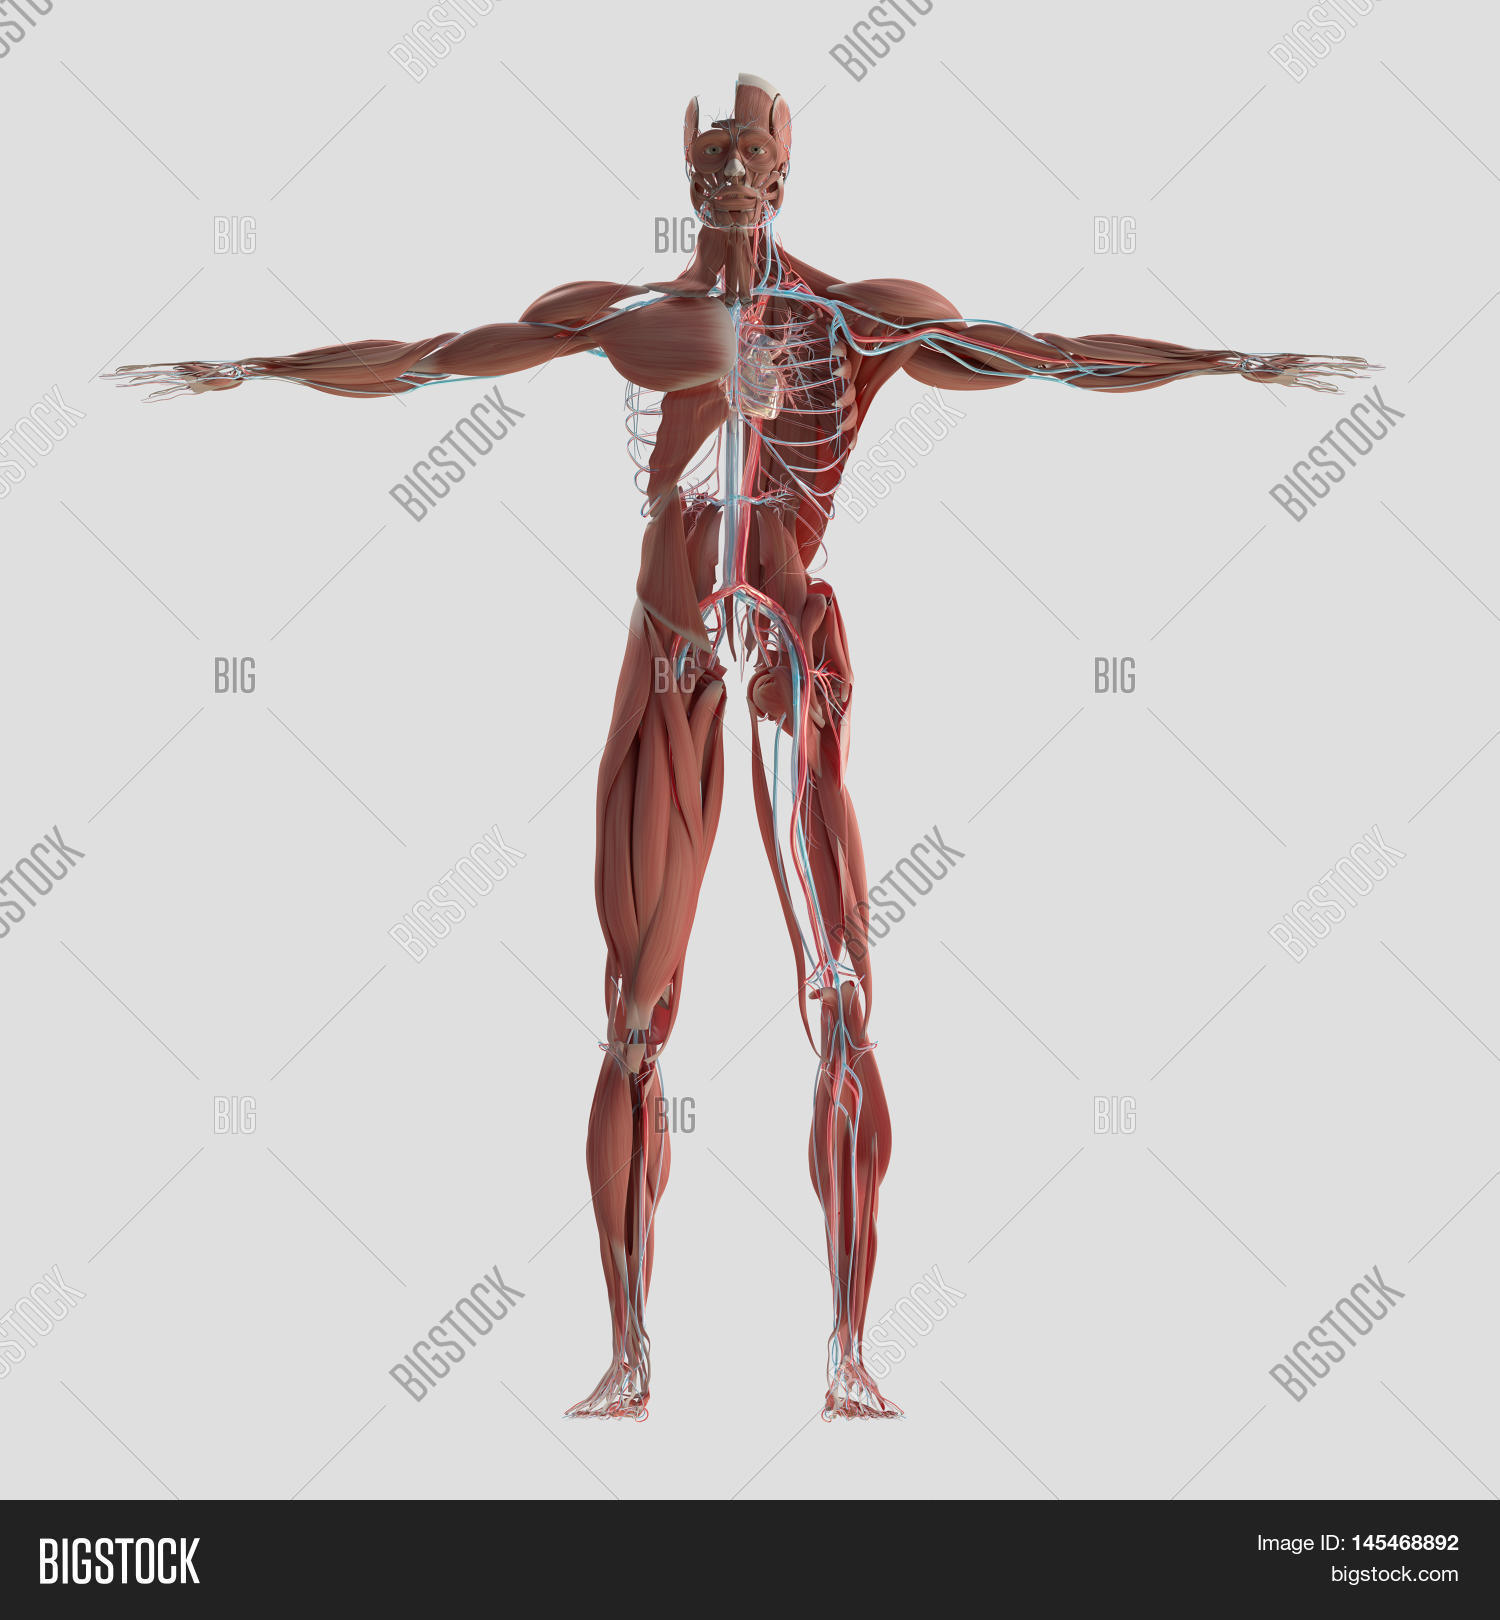 Human Anatomy Full Image & Photo (Free Trial) | Bigstock